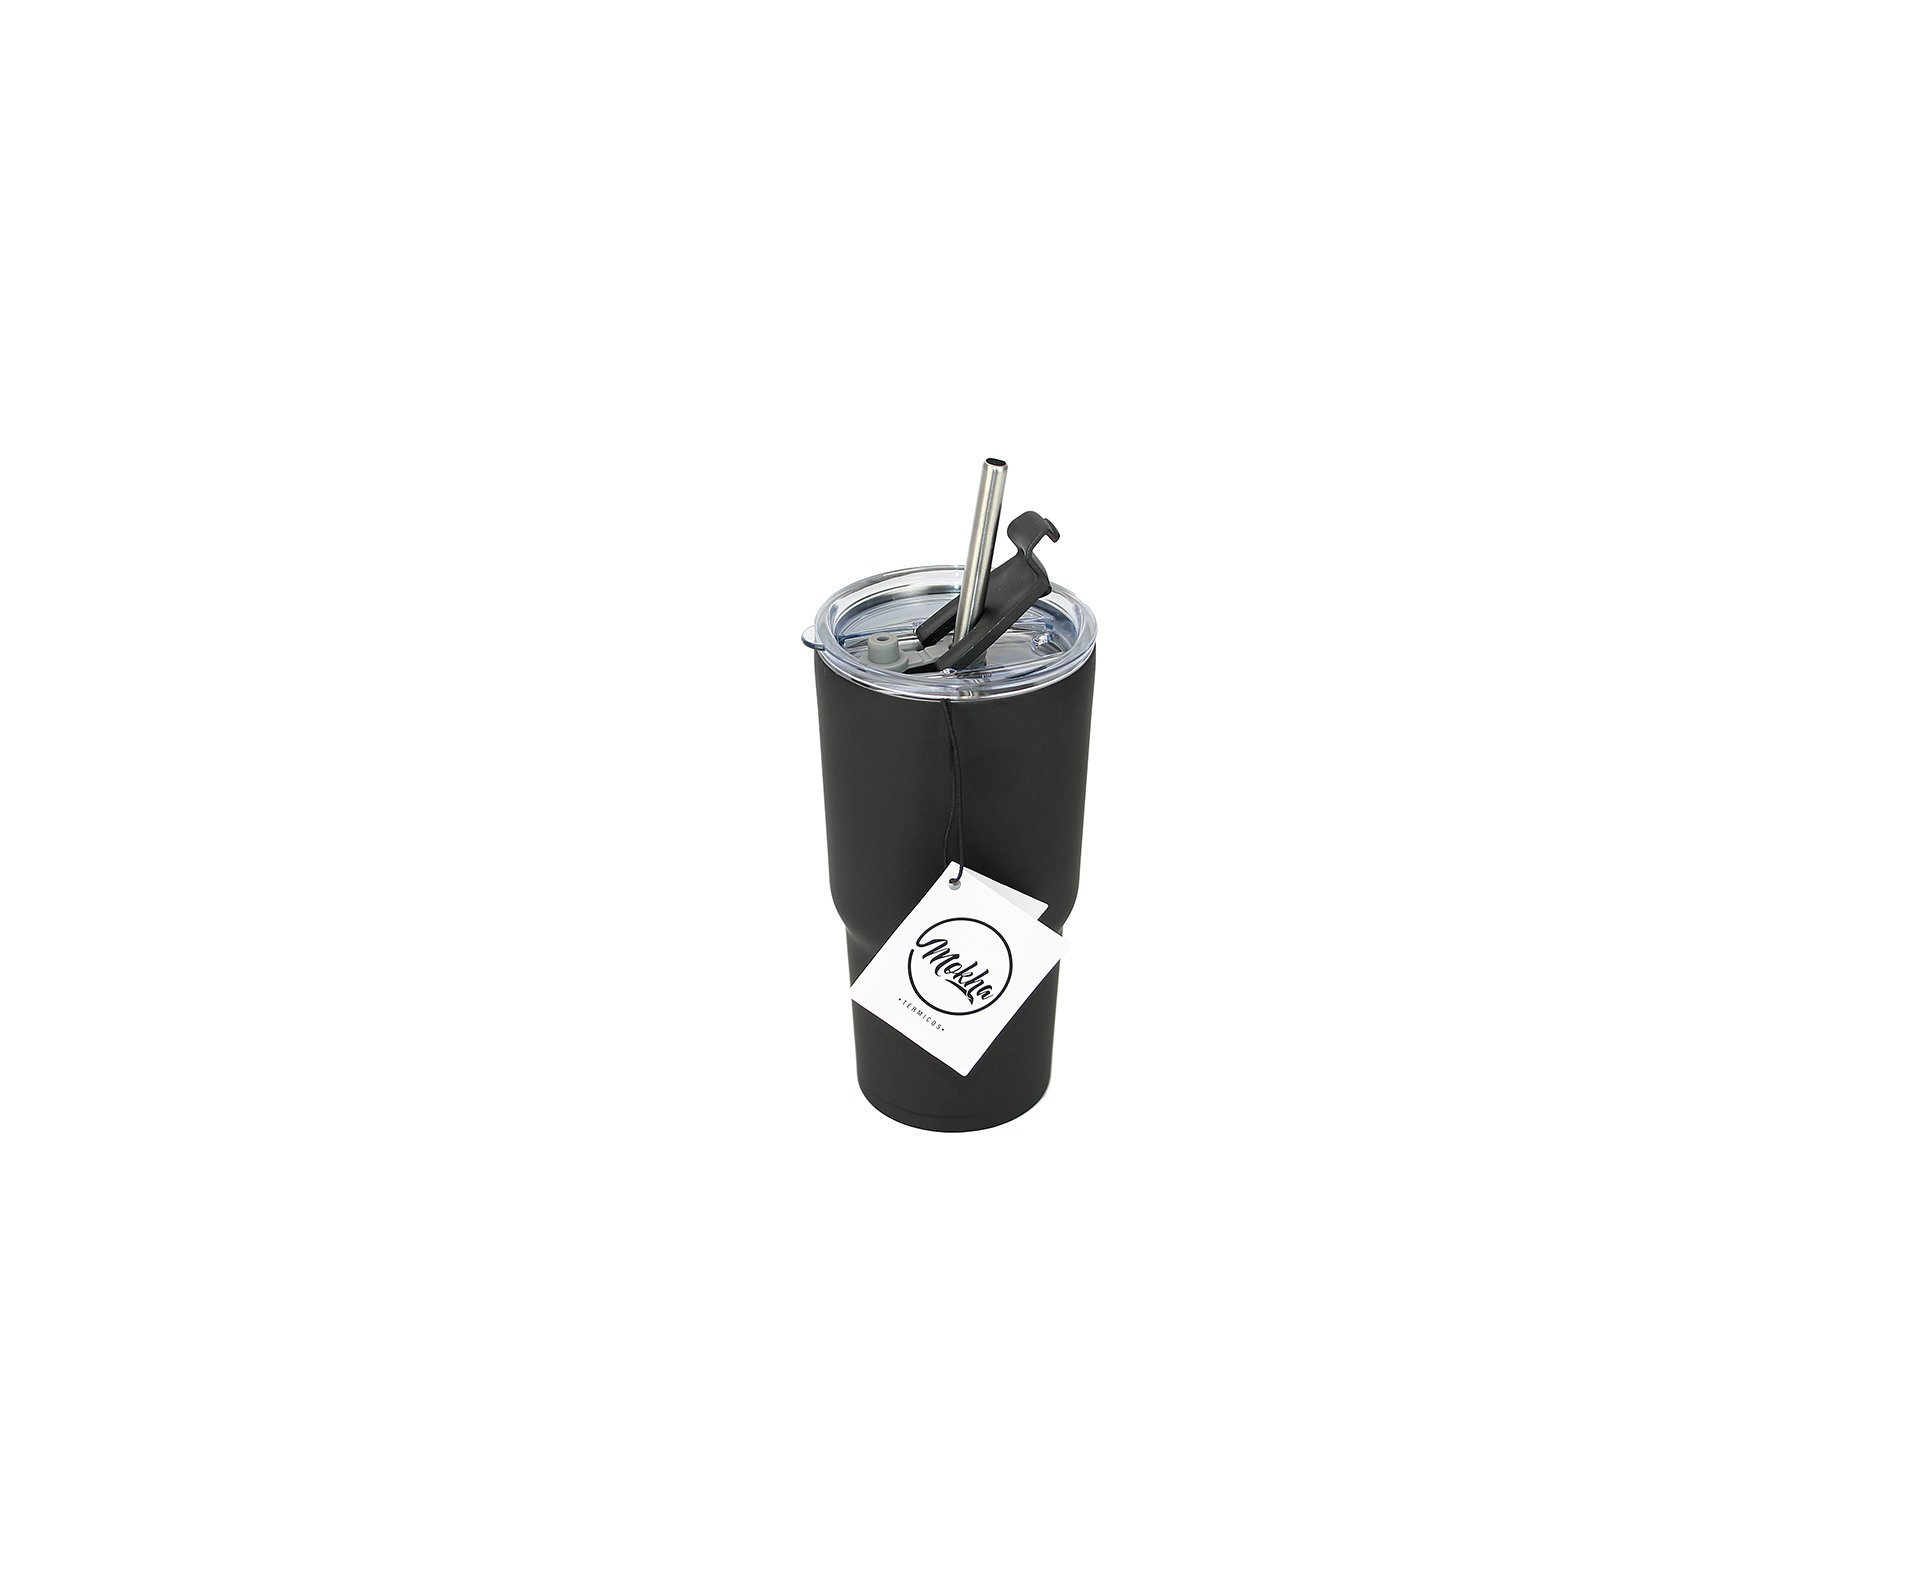 Copo Térmico Beezer Inox 600ml Cerveja Chopp Drink Preto - Mokha